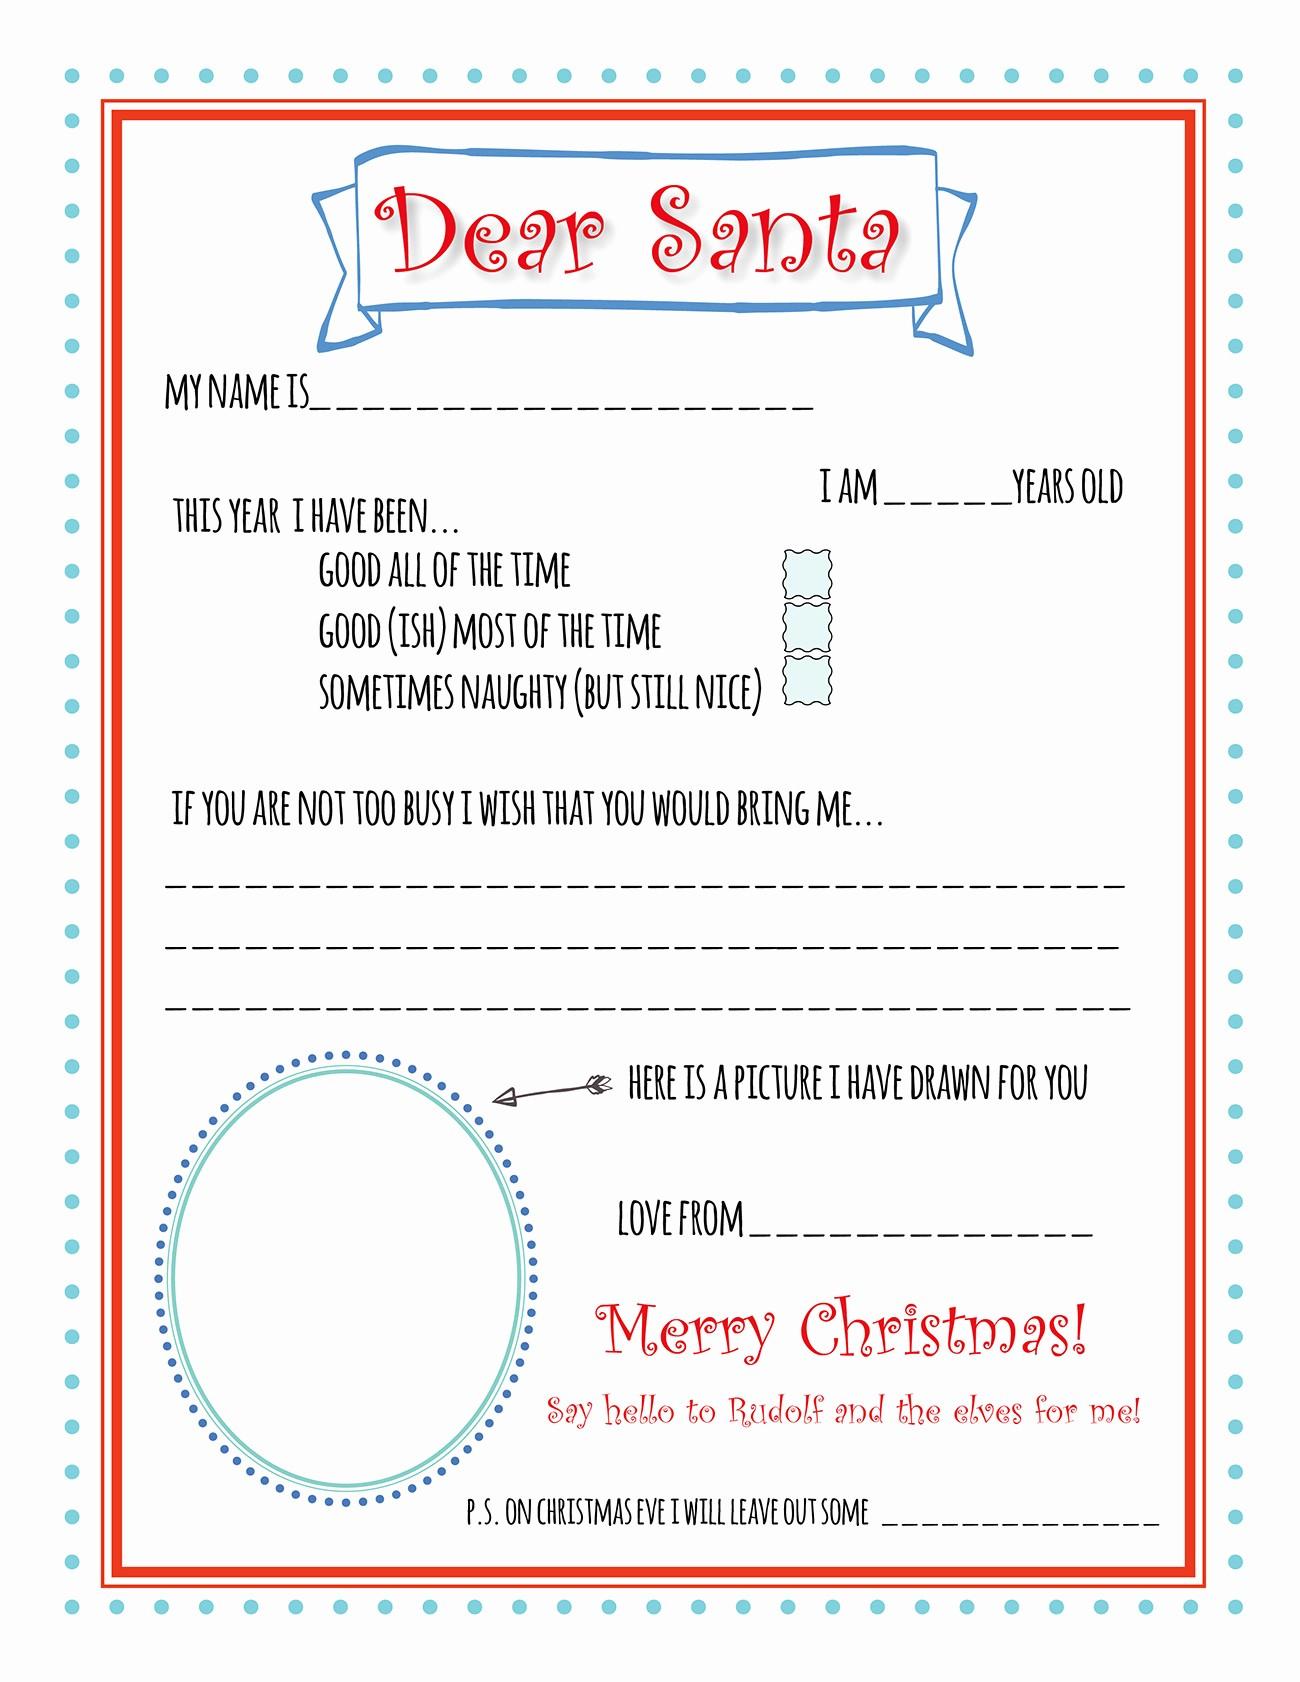 Letter to Santa Claus Templates Elegant Santa Letter Printable Template Bunny Peculiar